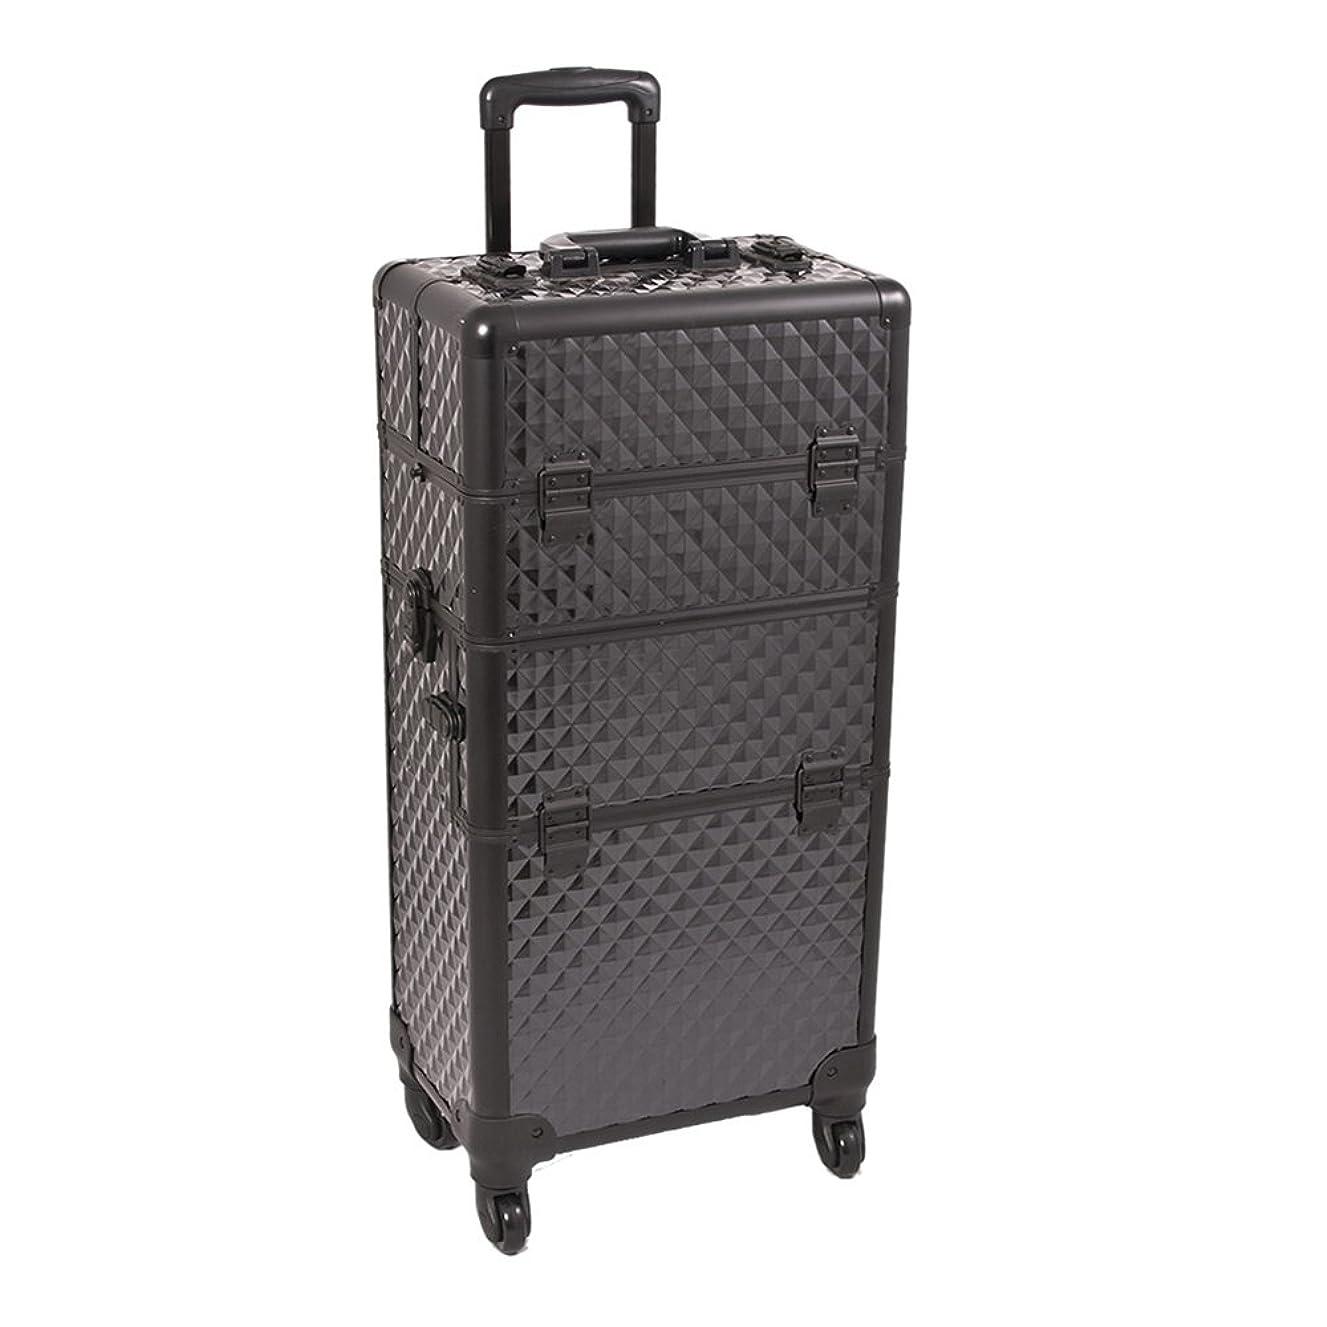 Craft Accents I3561 Diamond Trolley Craft/Quilting Storage Case, Black